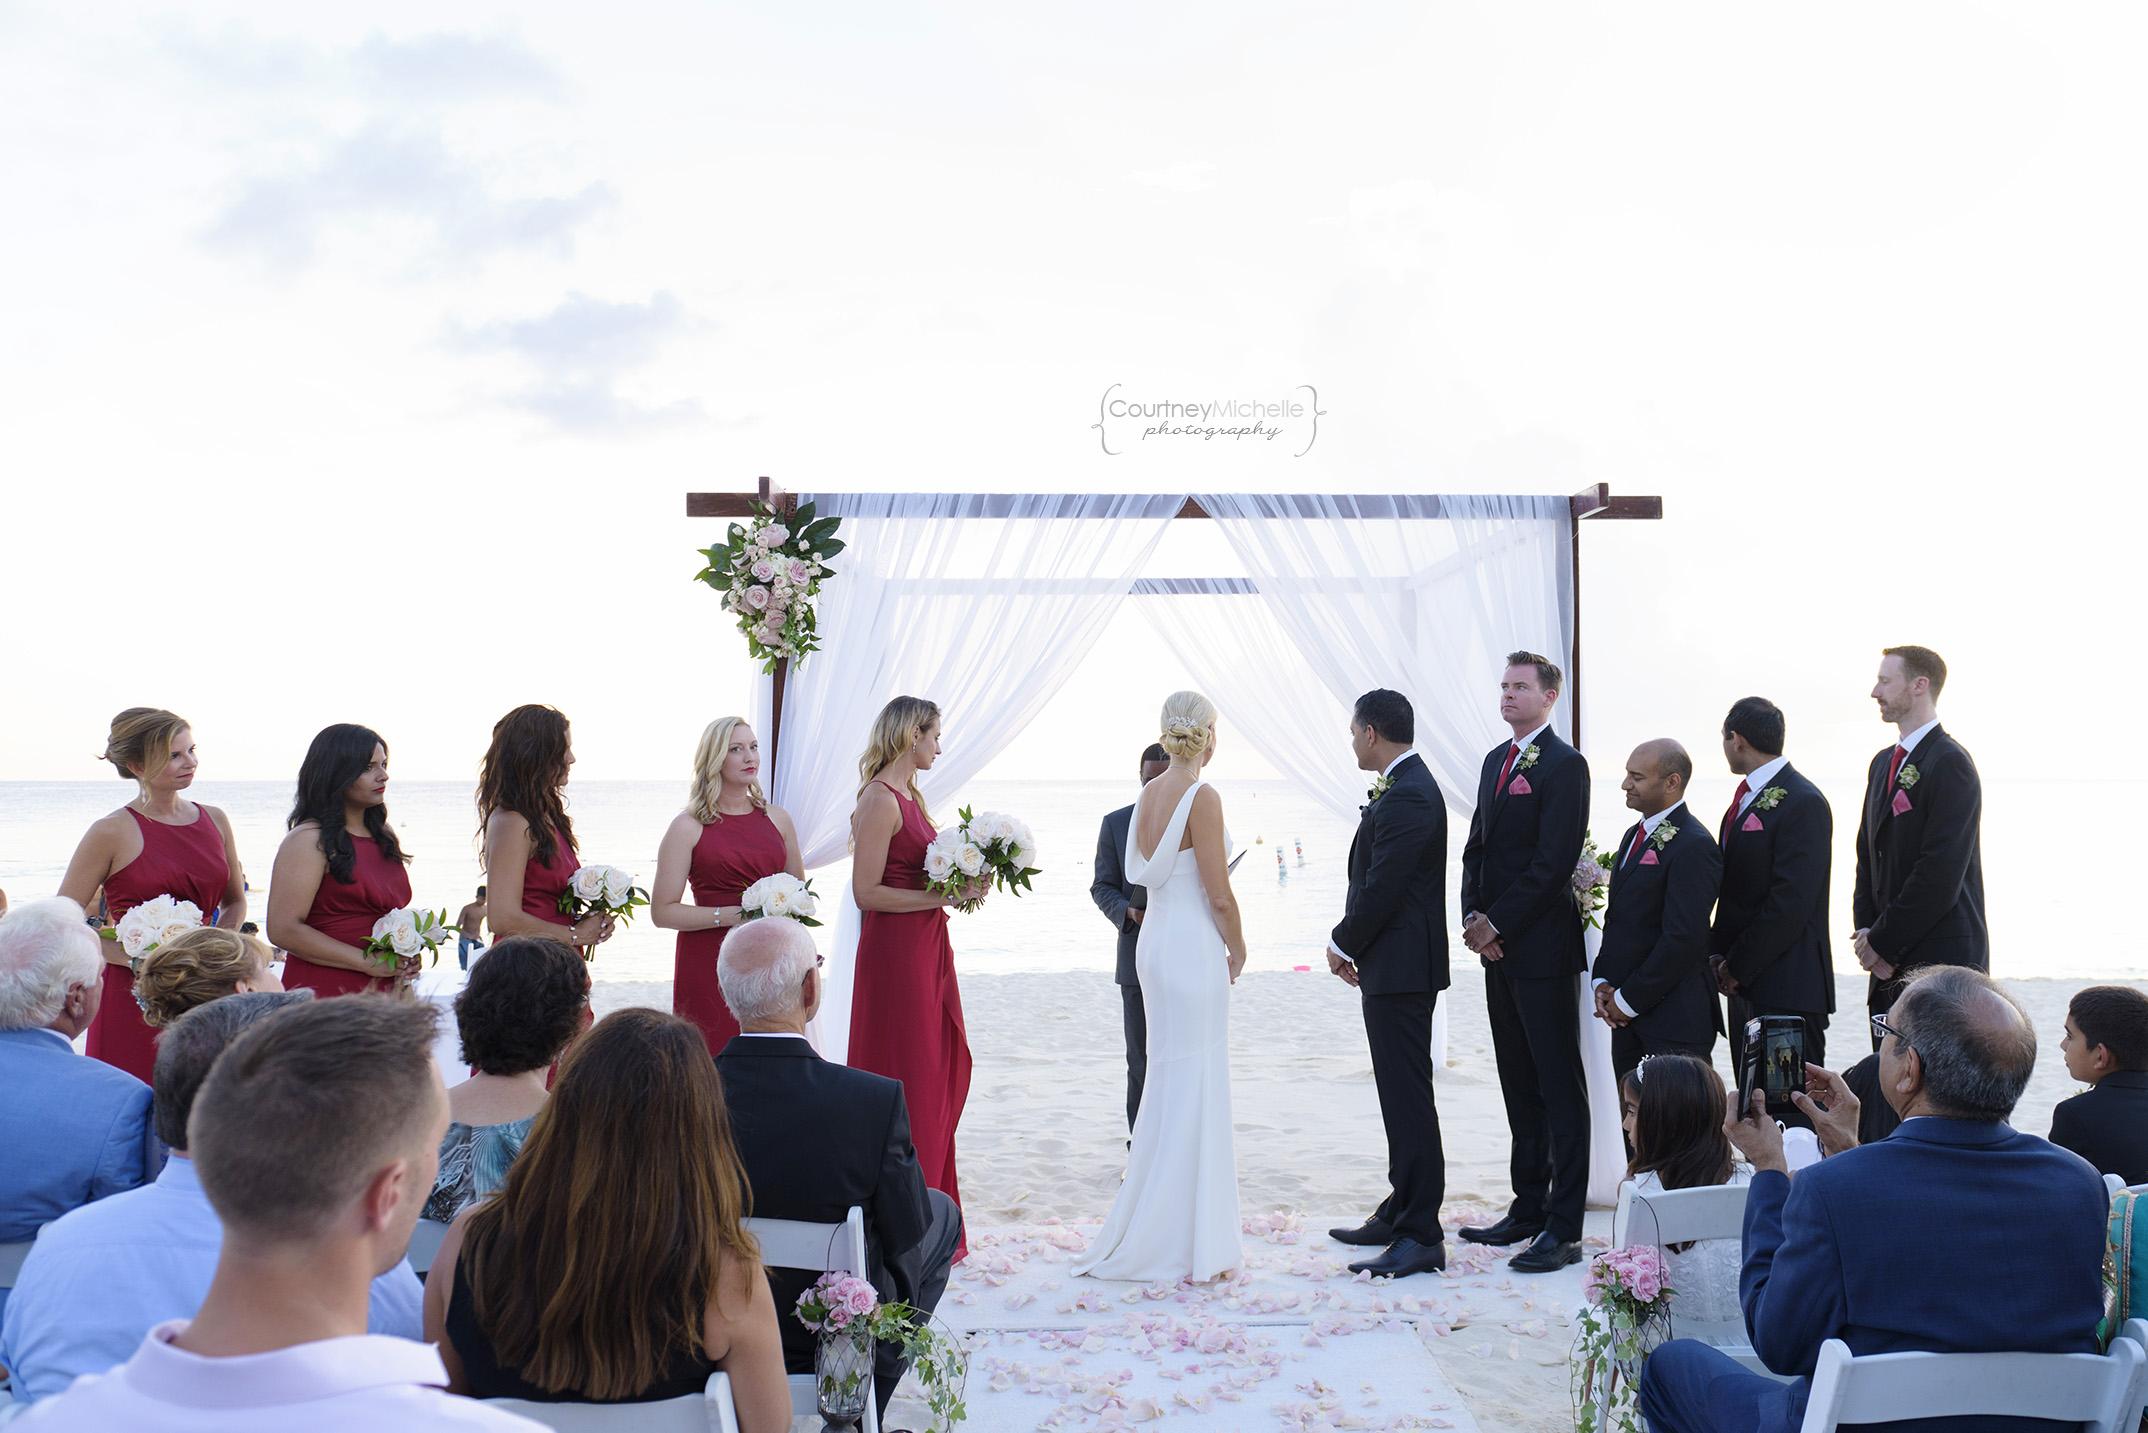 wedding-party-grand-cayman-beach-wedding-photography-by-courtney-laper©CopyrightCMP-LeaAnneRaj-7799.jpg